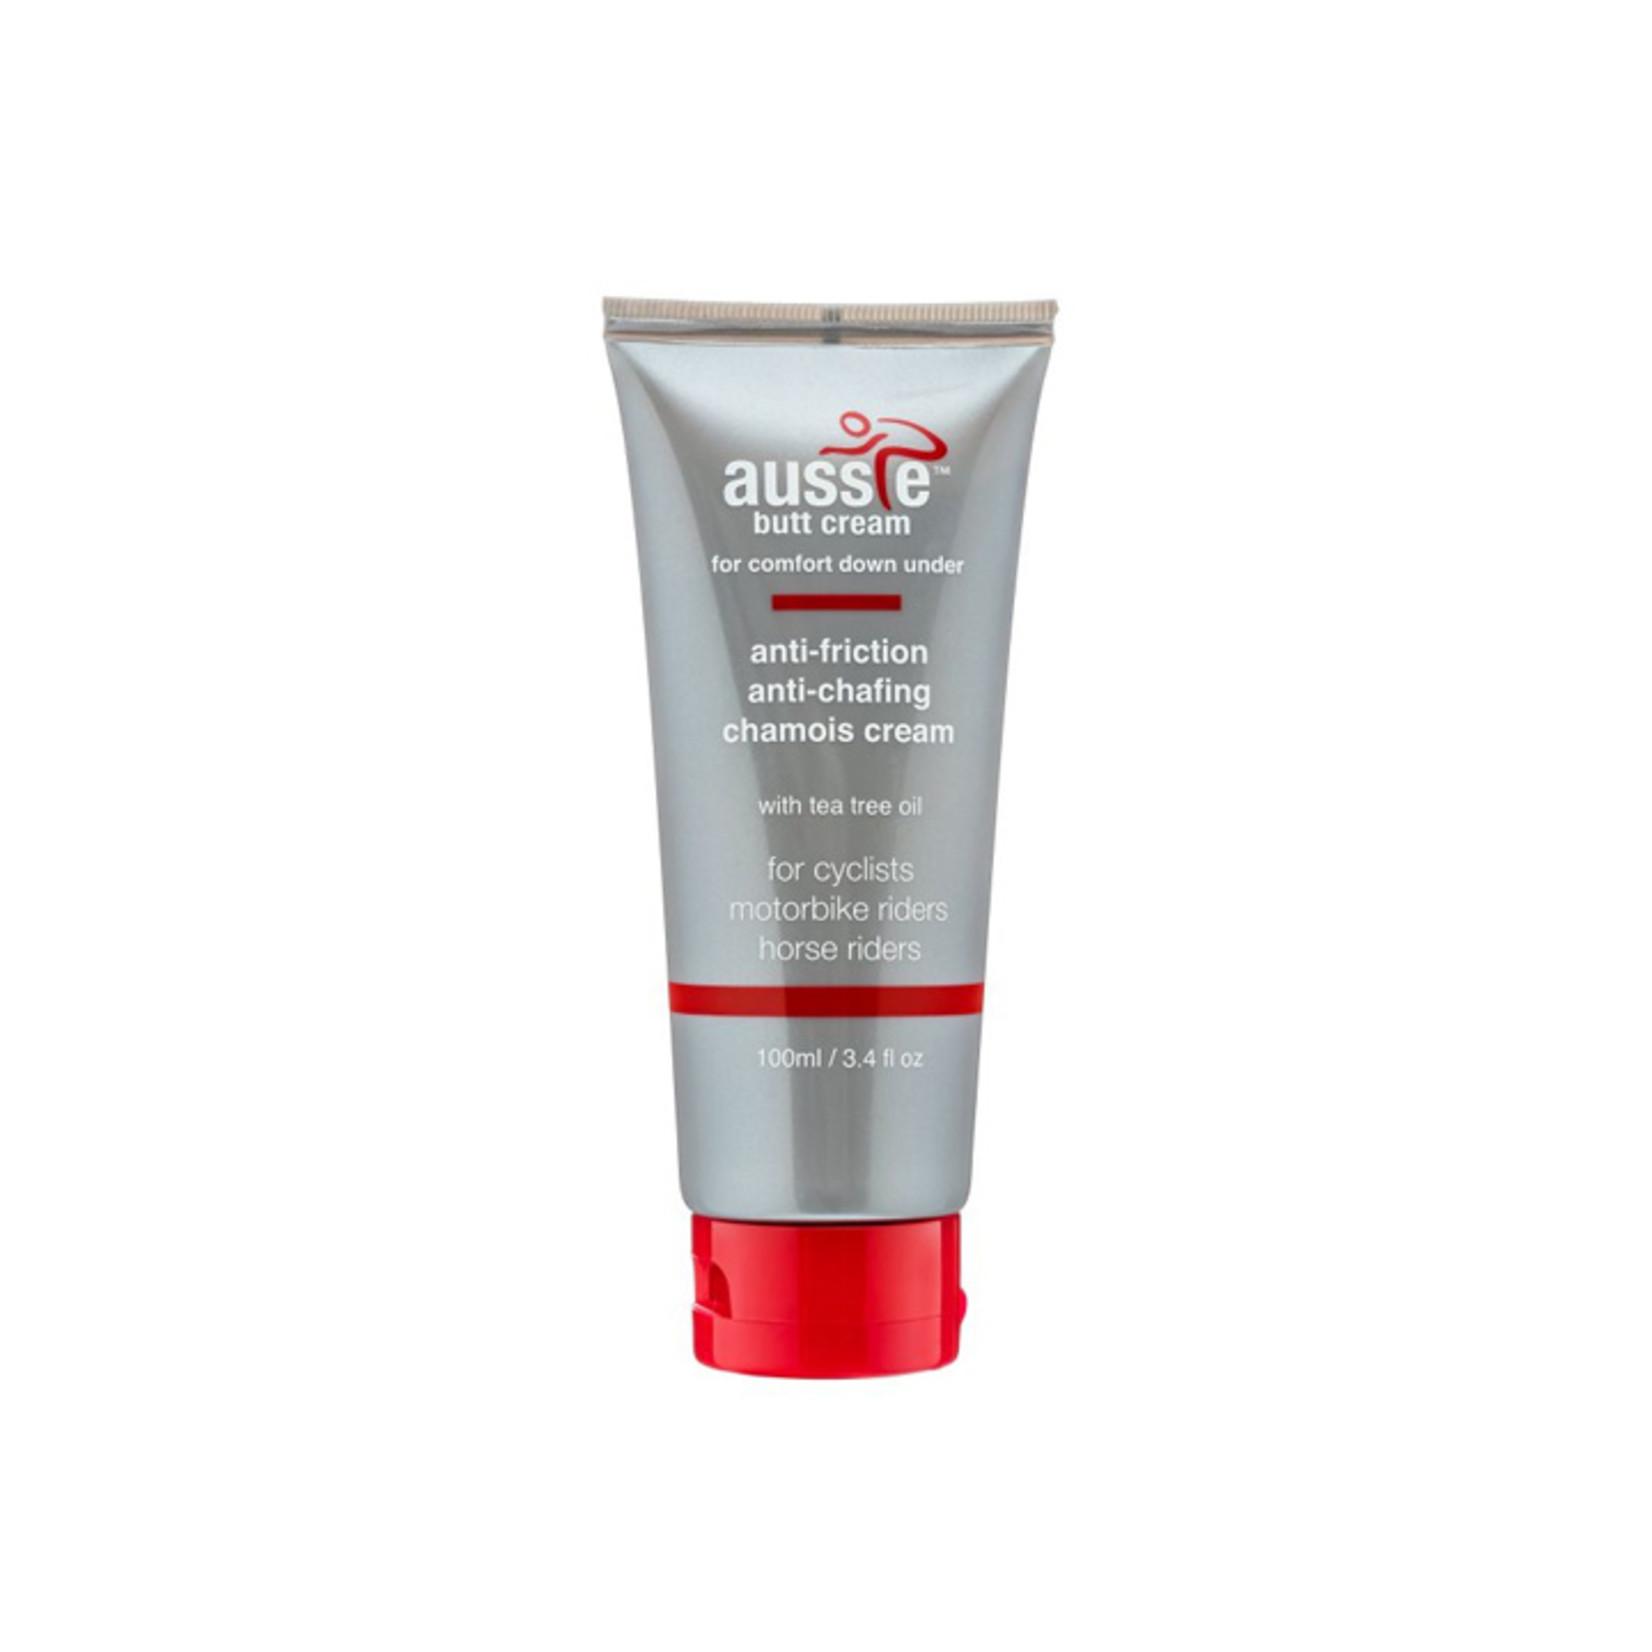 Aussie Butt Chamoix Cream 100mL Tube